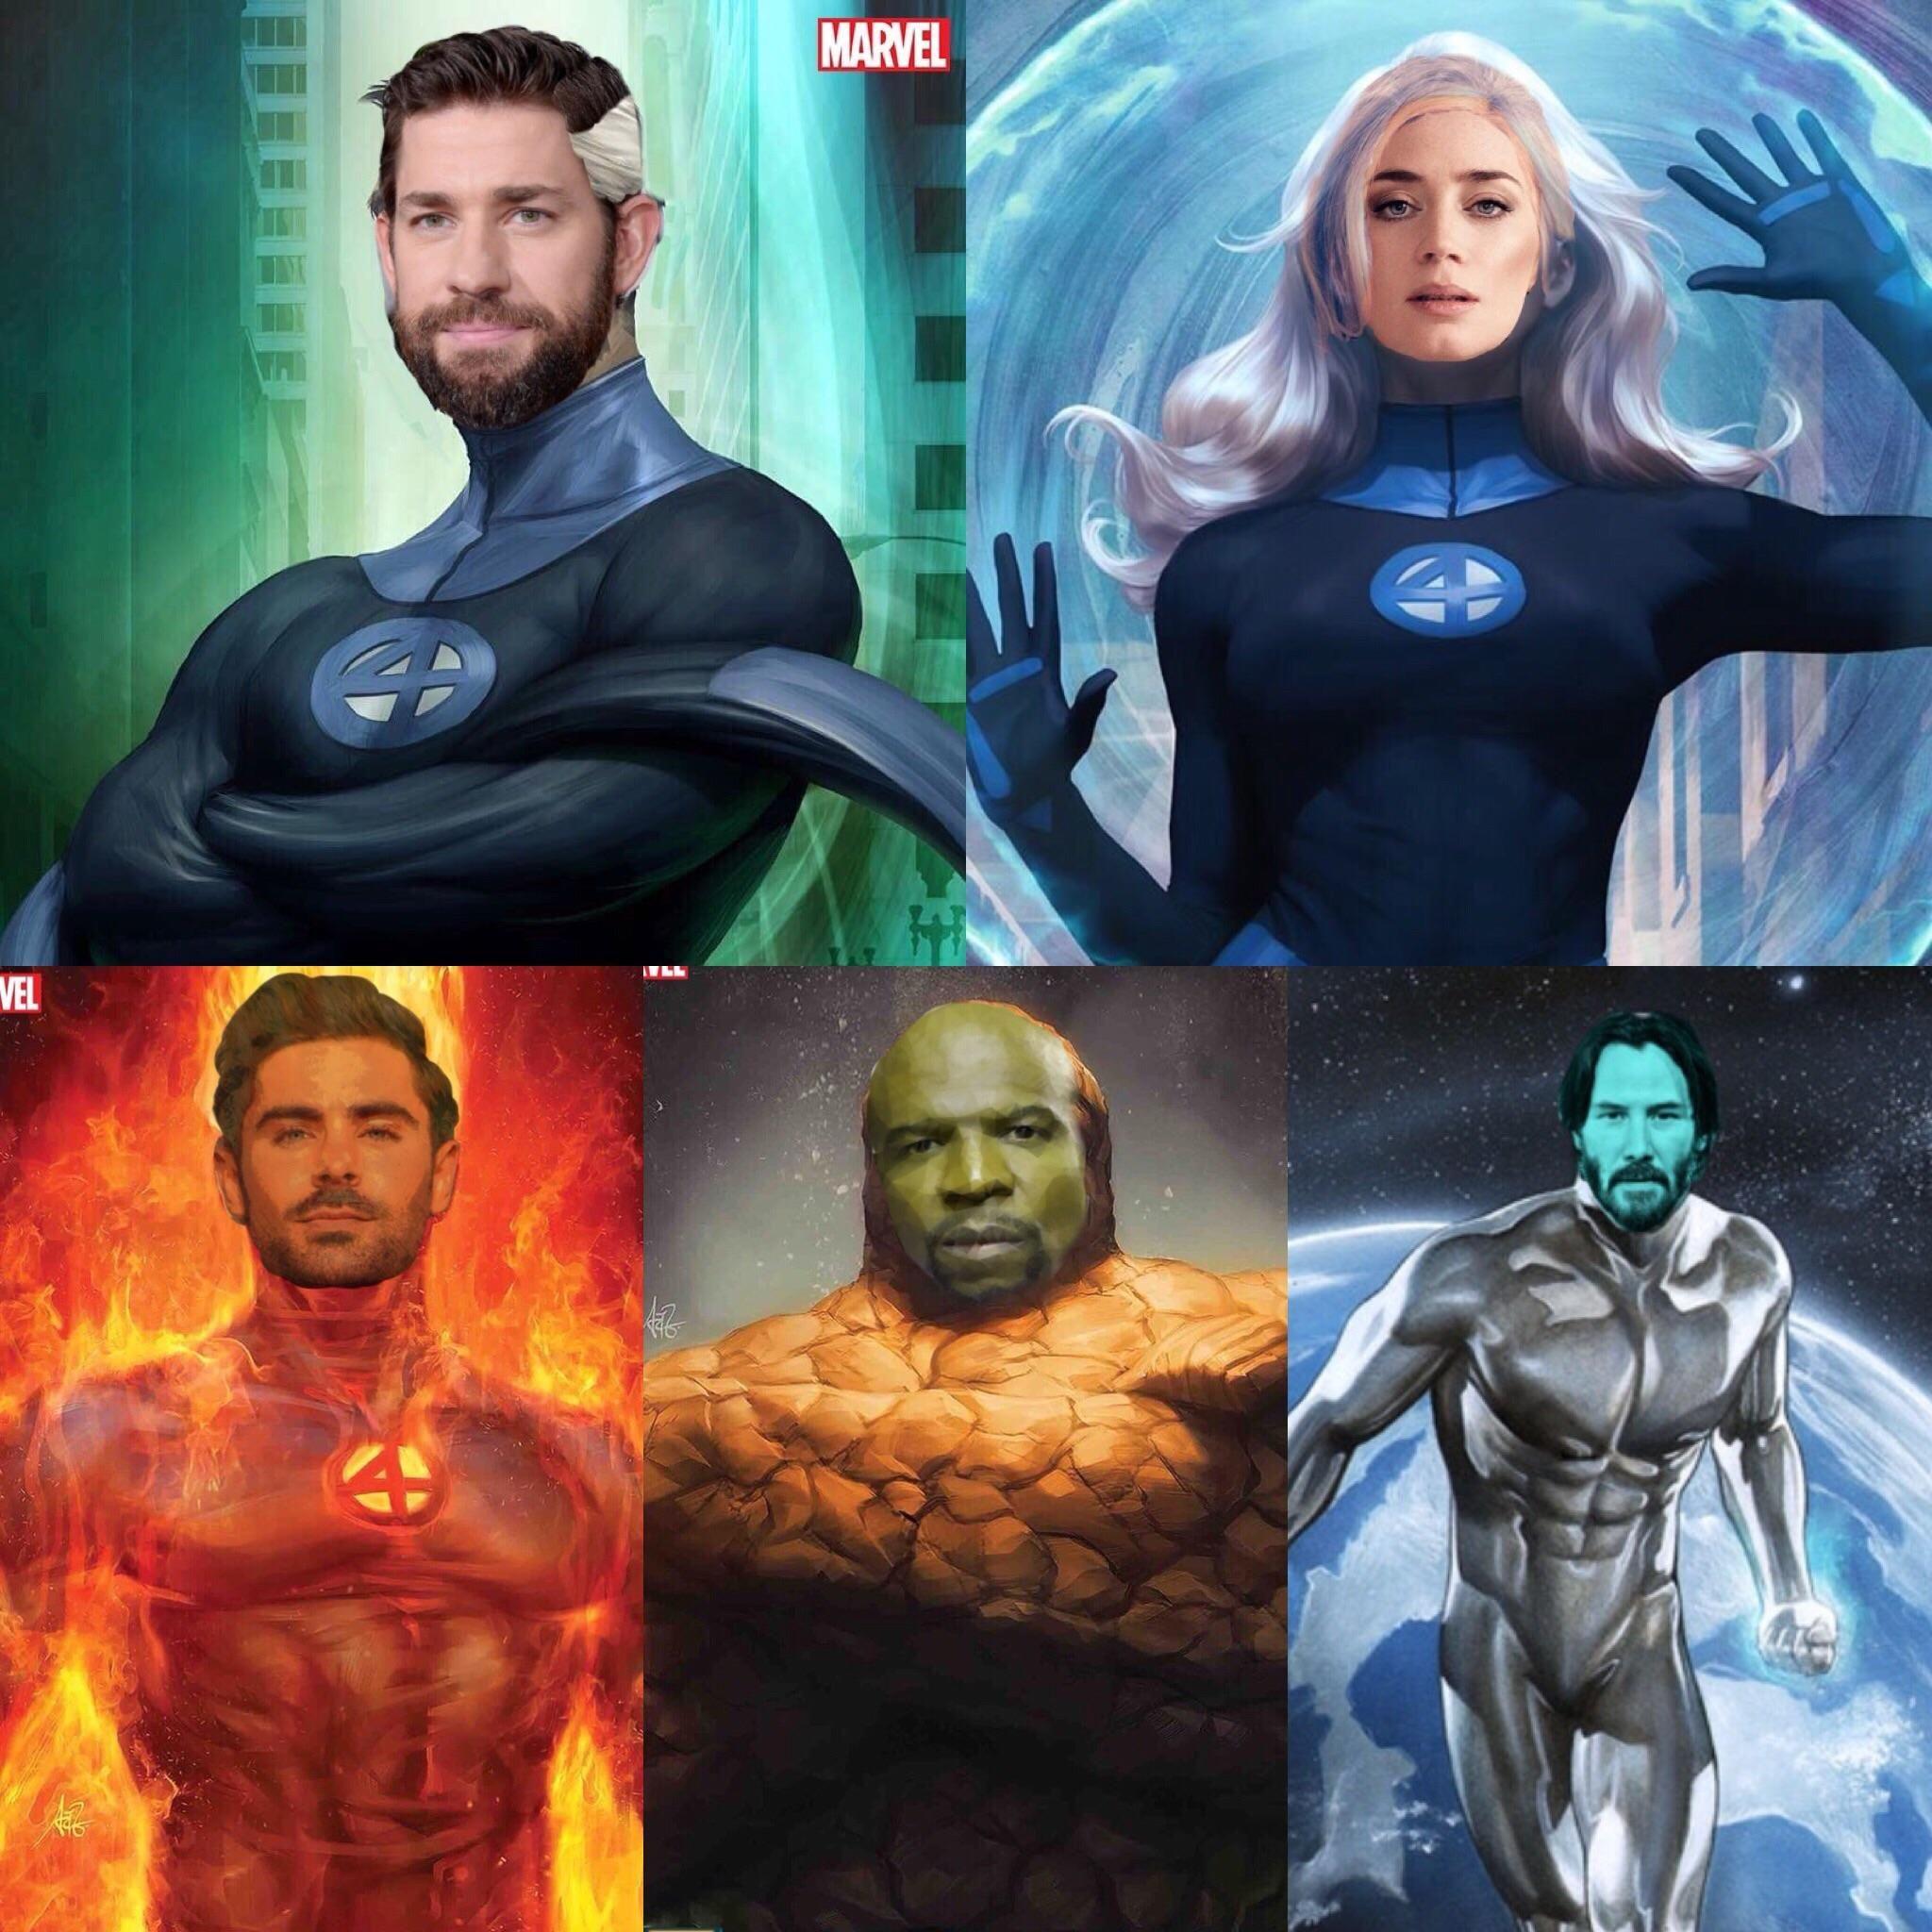 My Fantastic Four Mcu Fancast Marvel Comics Wallpaper Marvel Artwork Fantastic Four